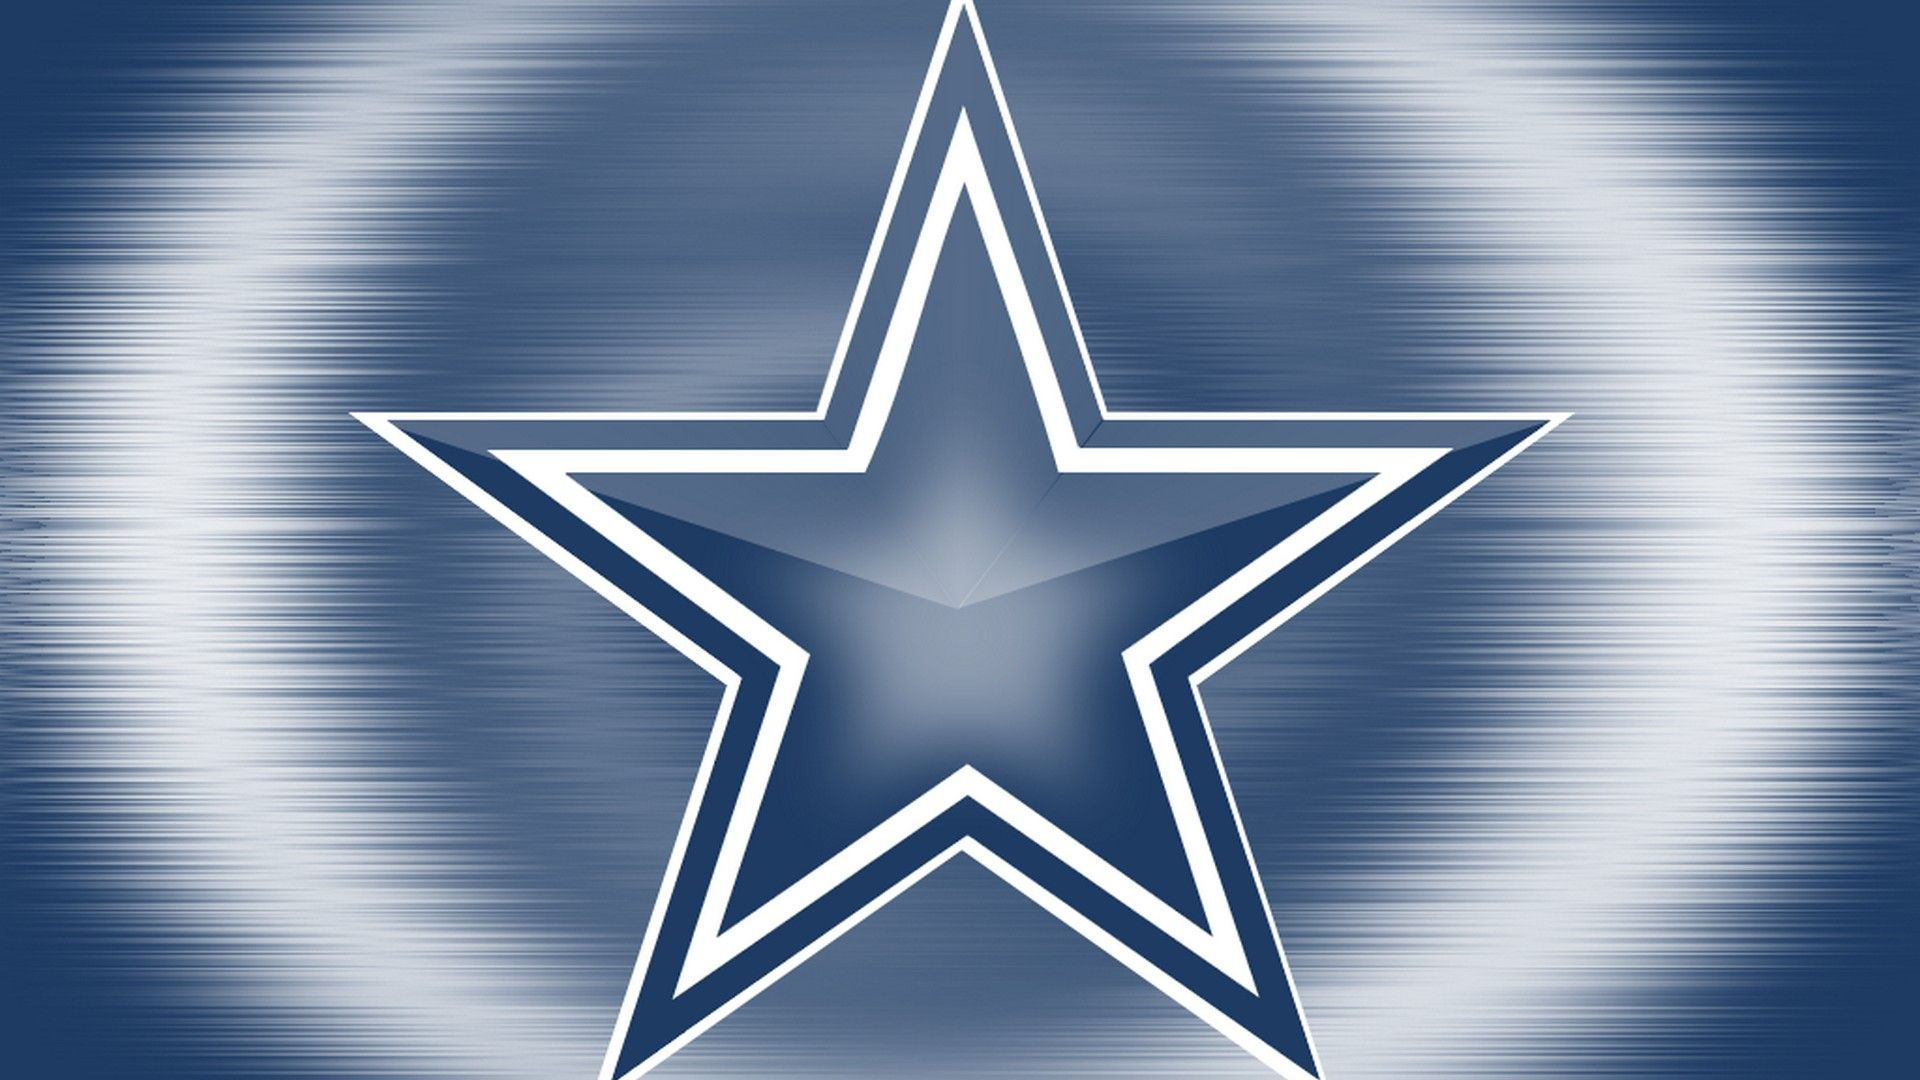 Windows Wallpaper Dallas Cowboys 2020 Nfl Football Wallpapers Dallas Cowboys Wallpaper Dallas Cowboys Background Dallas Cowboys Logo